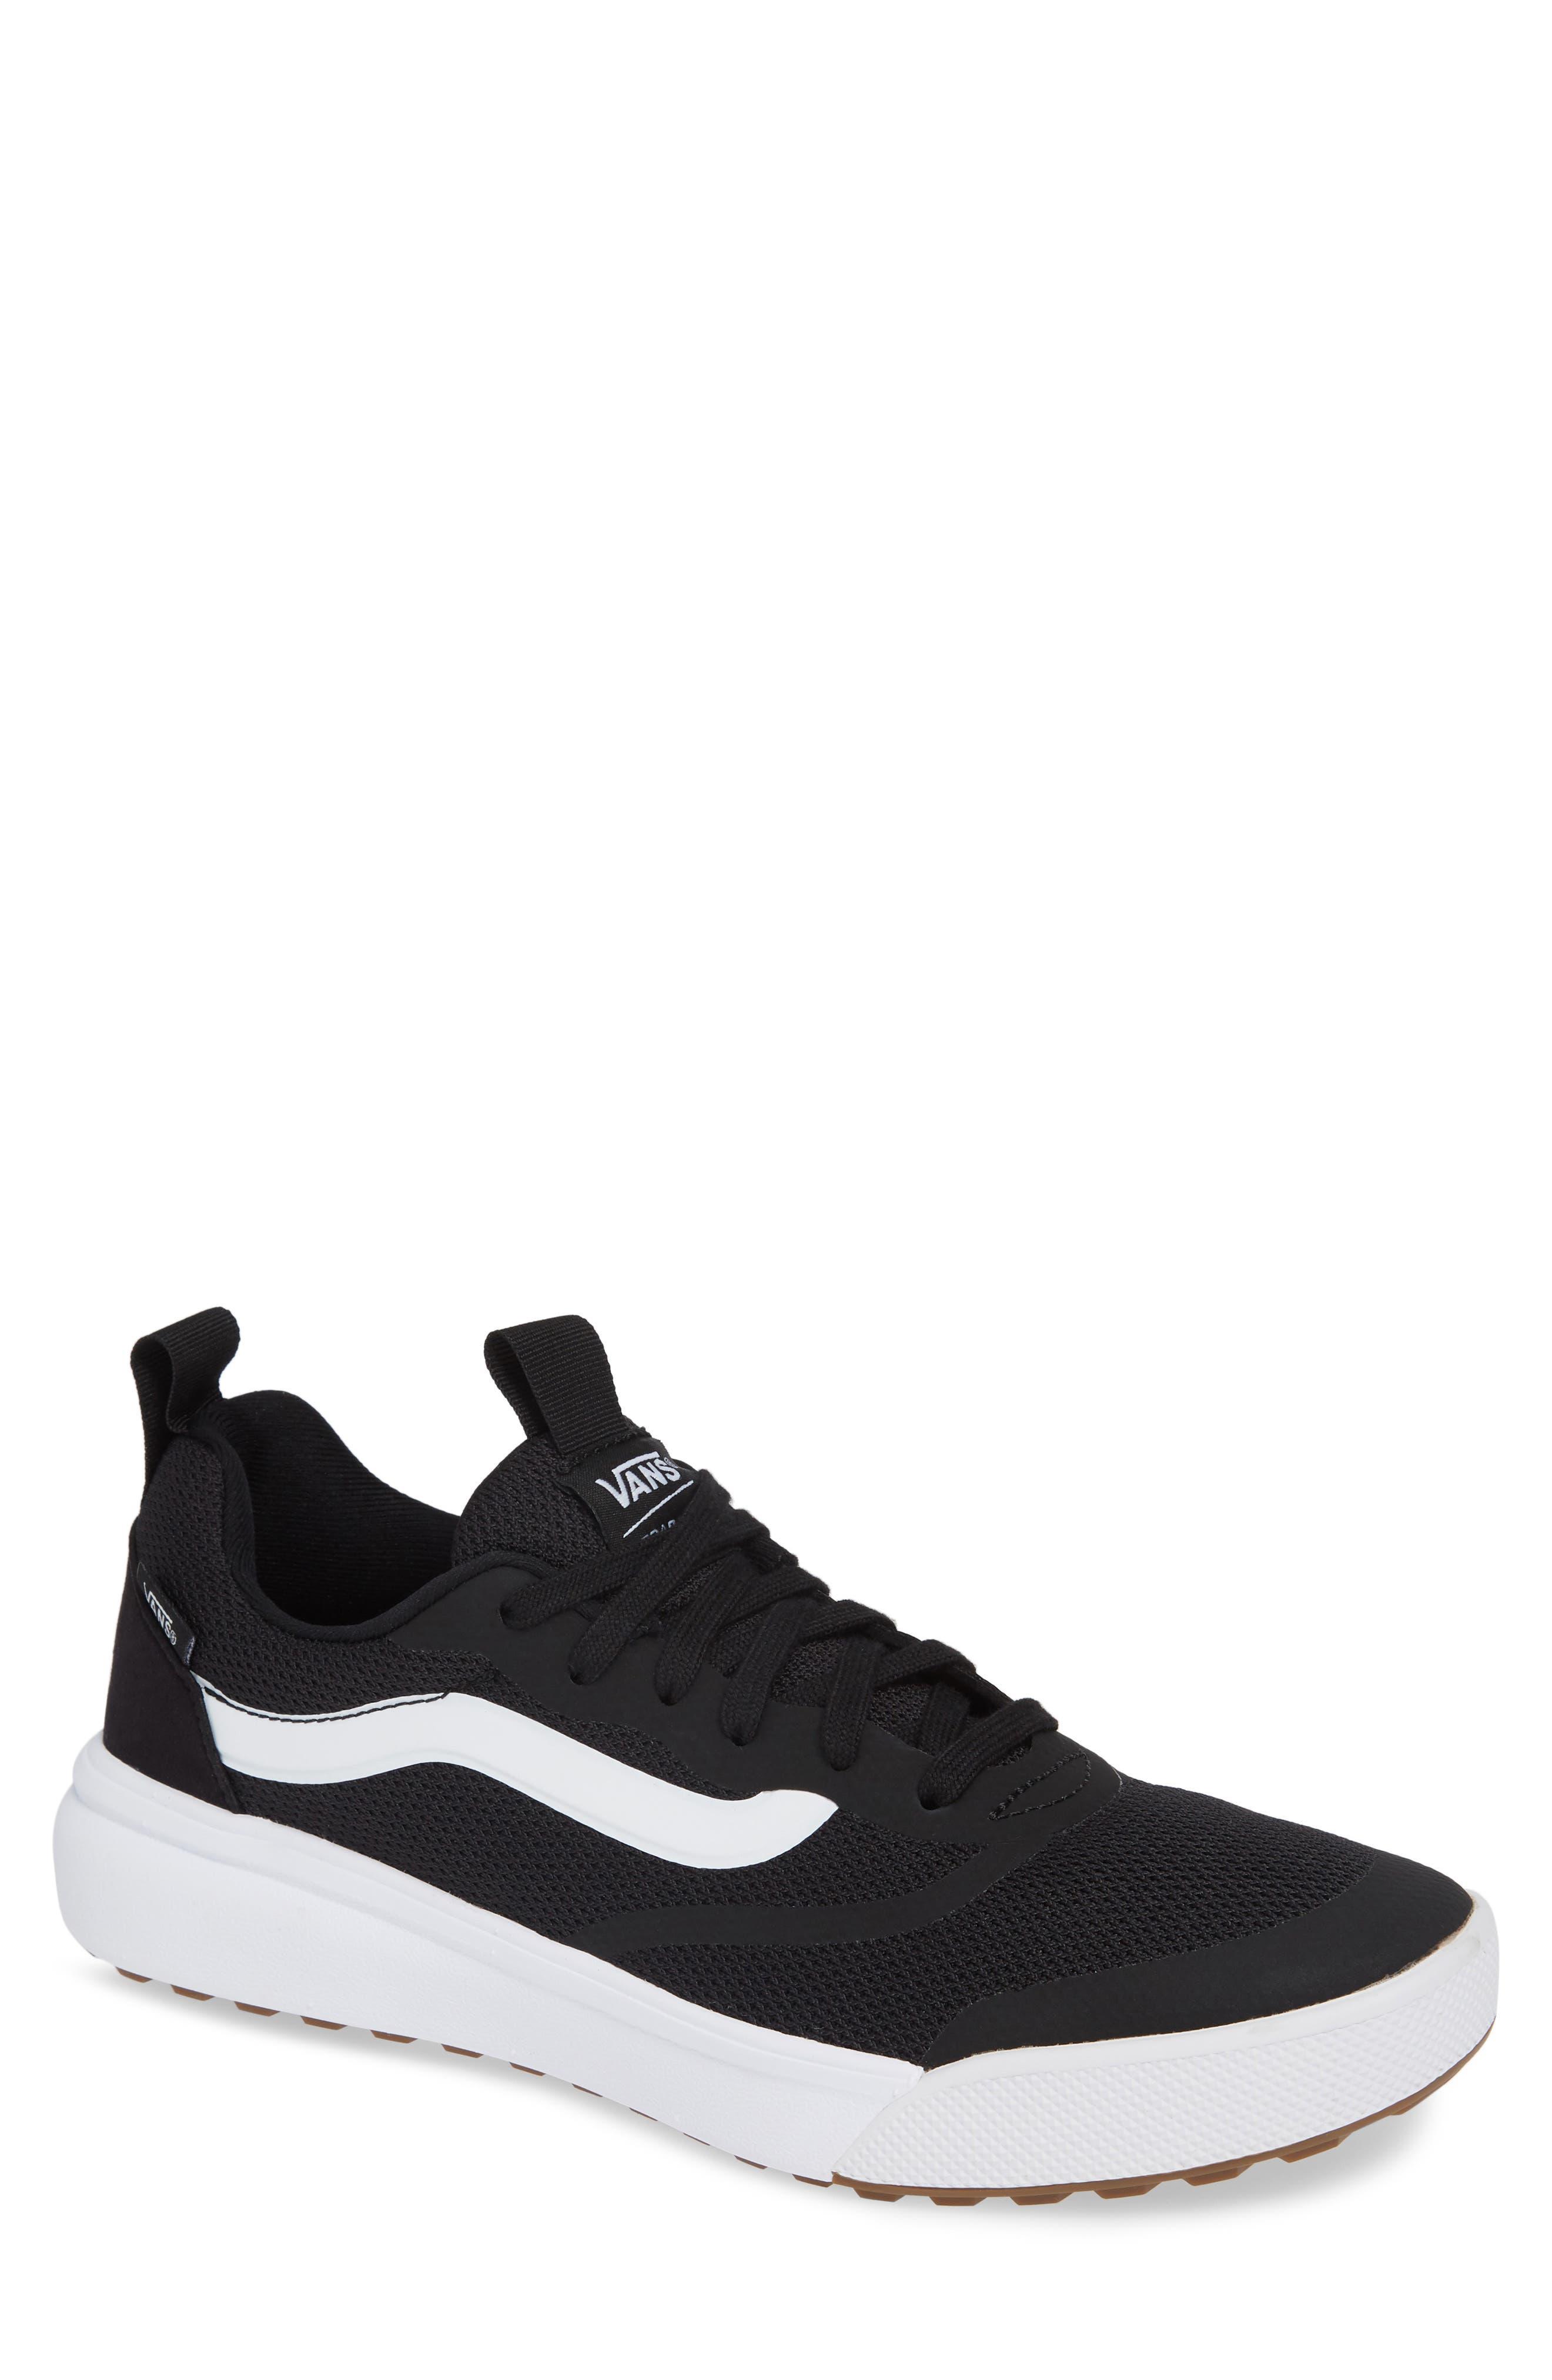 Ultrarange Rapidwield Sneaker,                             Main thumbnail 1, color,                             BLACK/ WHITE MESH